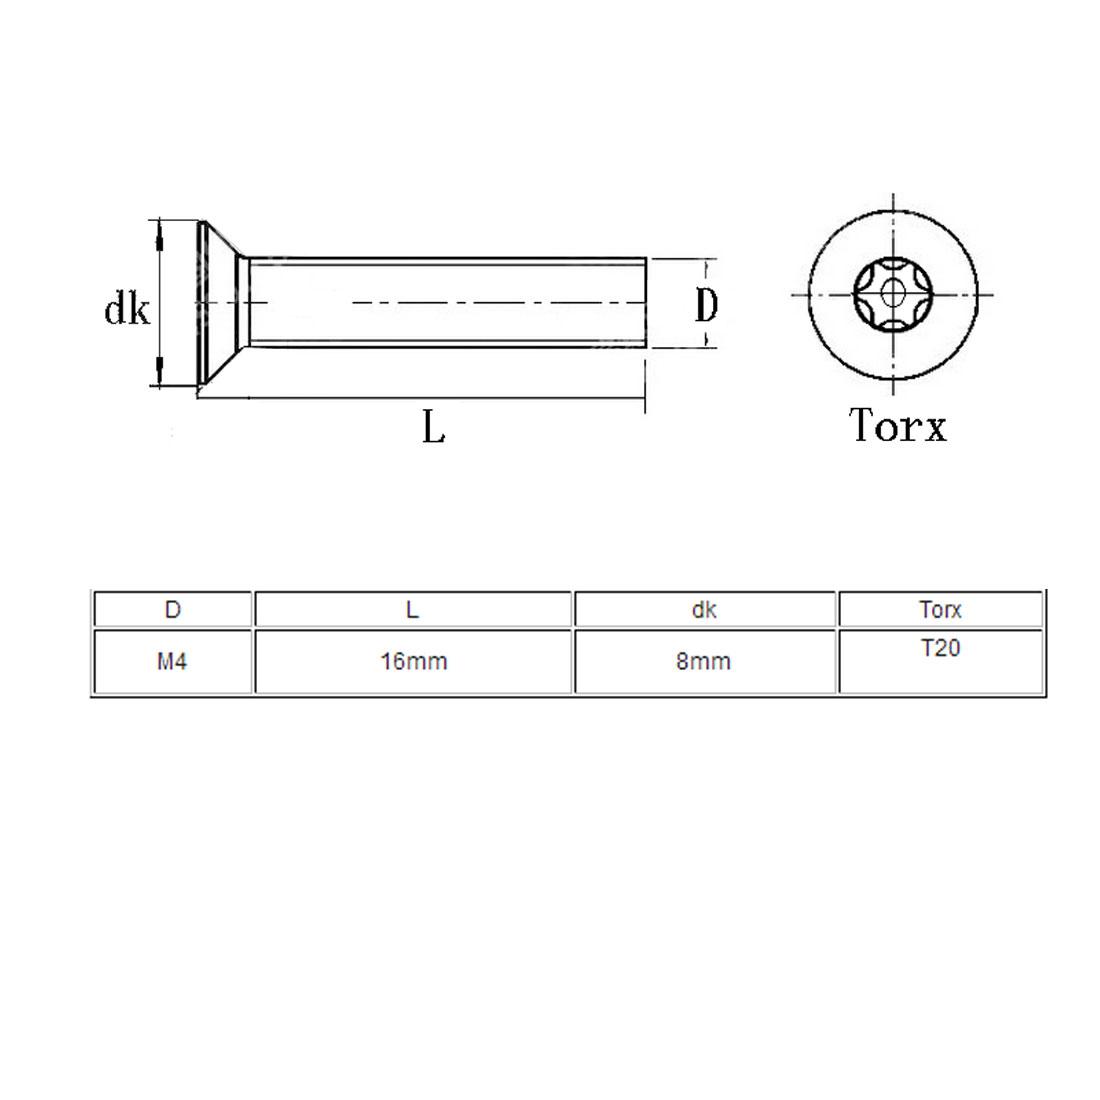 M4x16mm 304 Stainless Steel Flat Head Torx Pin Tamper Resistant Screws 20pcs - image 3 de 4